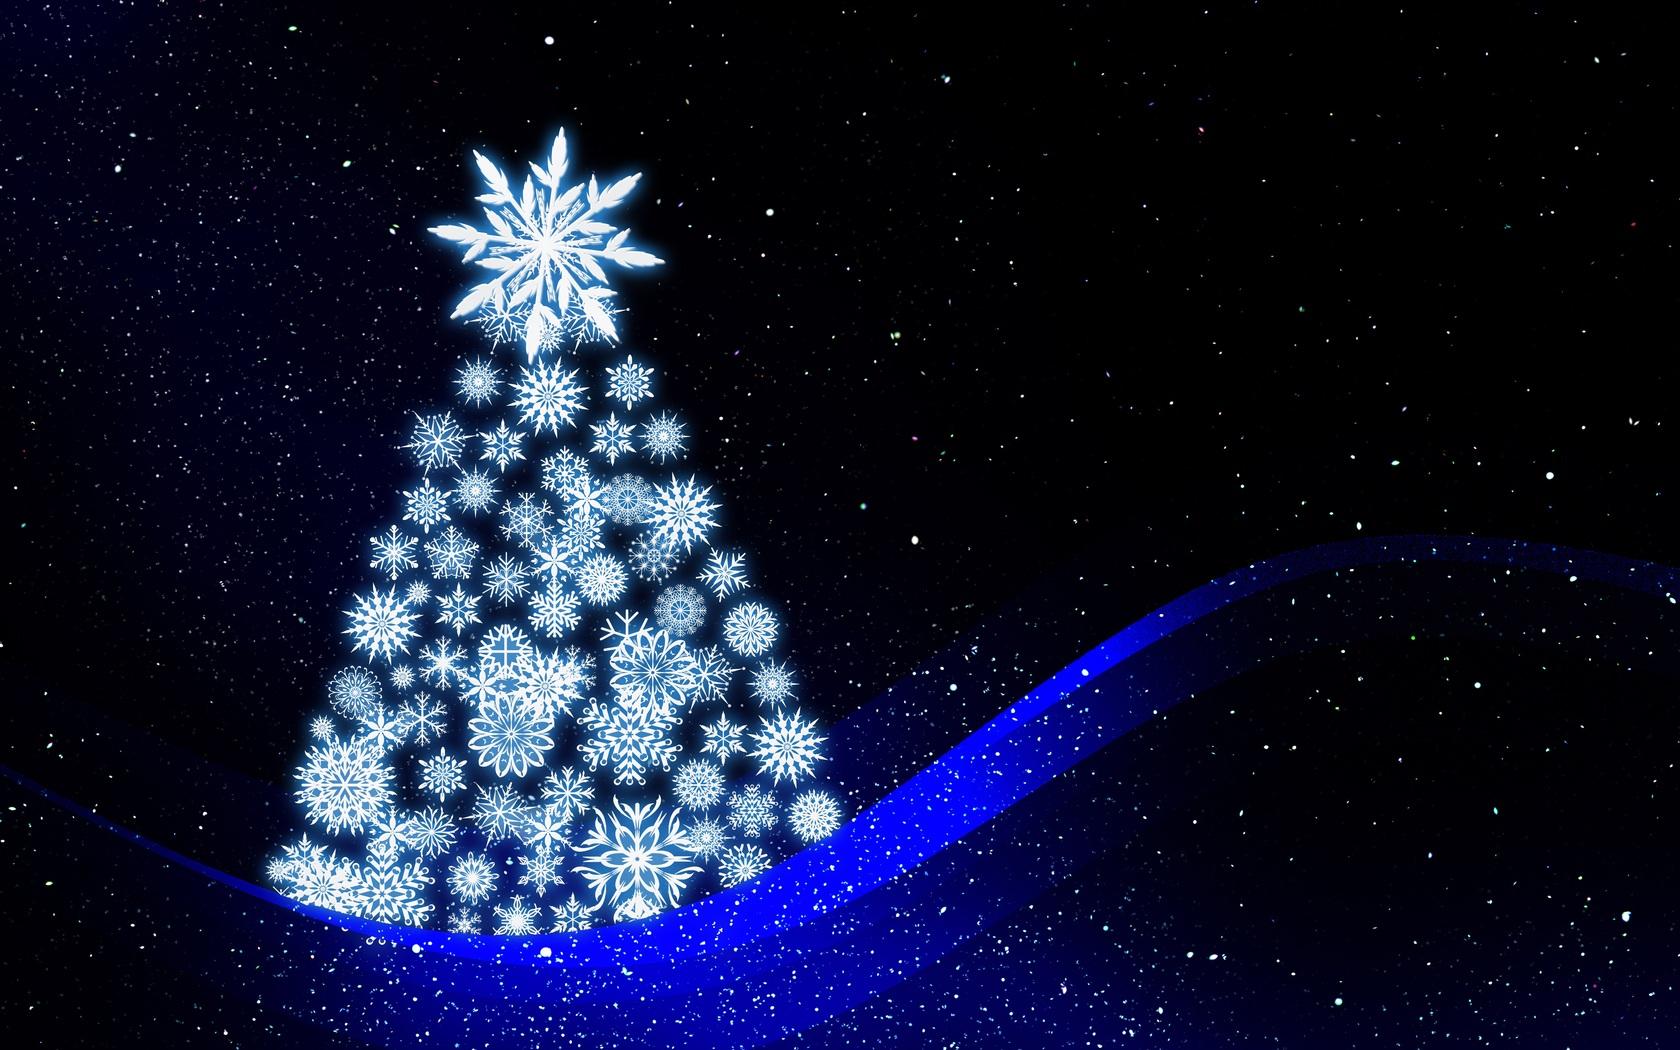 christmas-tree-lights-illustrations-1w.jpg